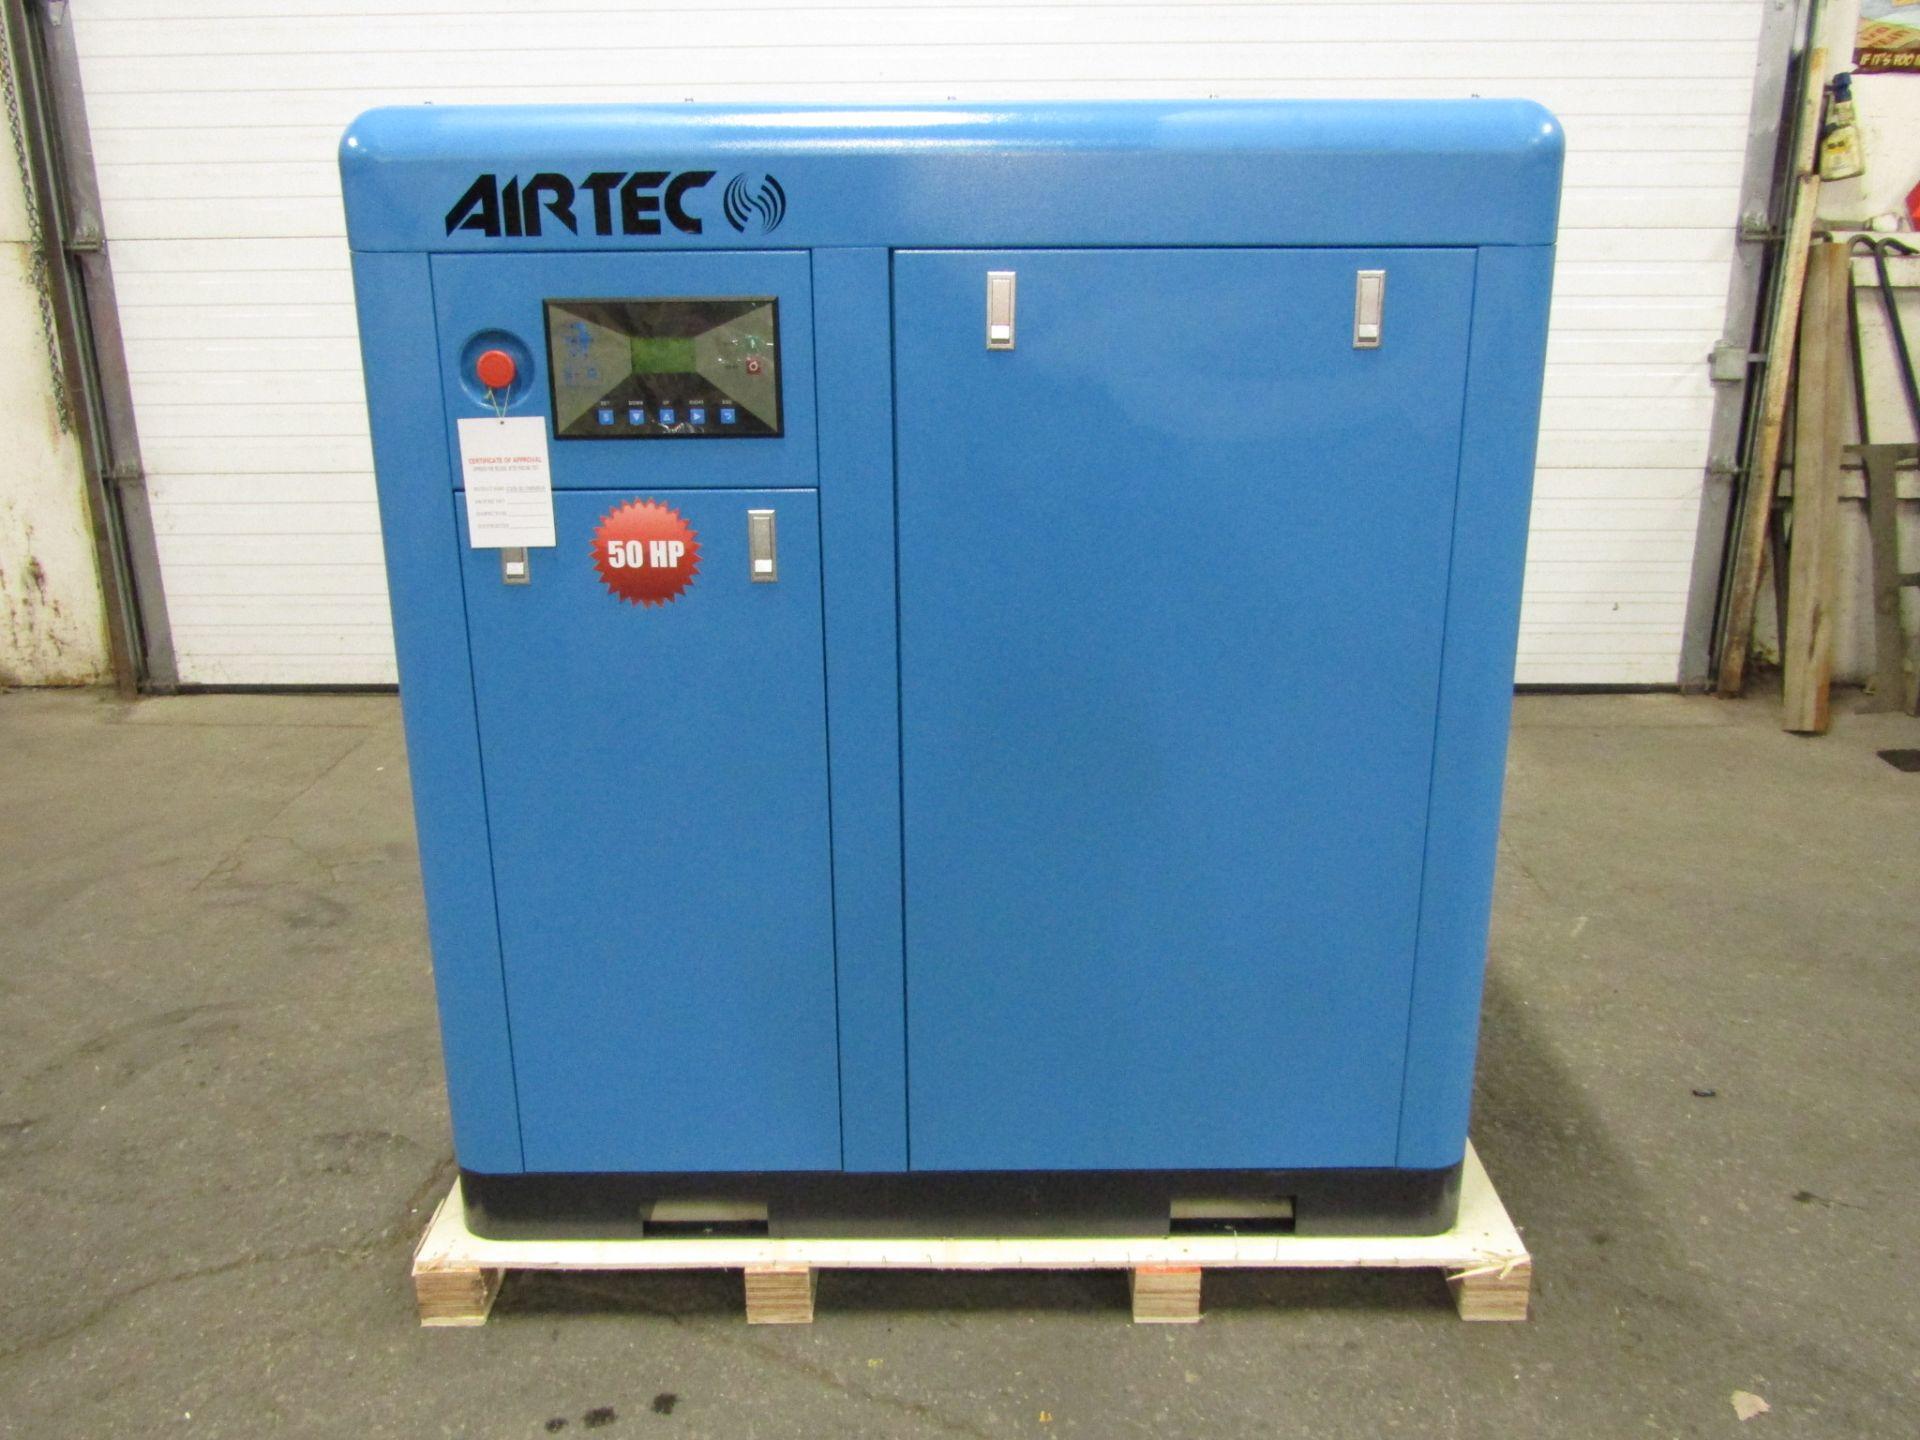 Lot 261 - Airtec 50HP Rotary Screw Air Compressor - MINT UNUSED COMPRESSOR